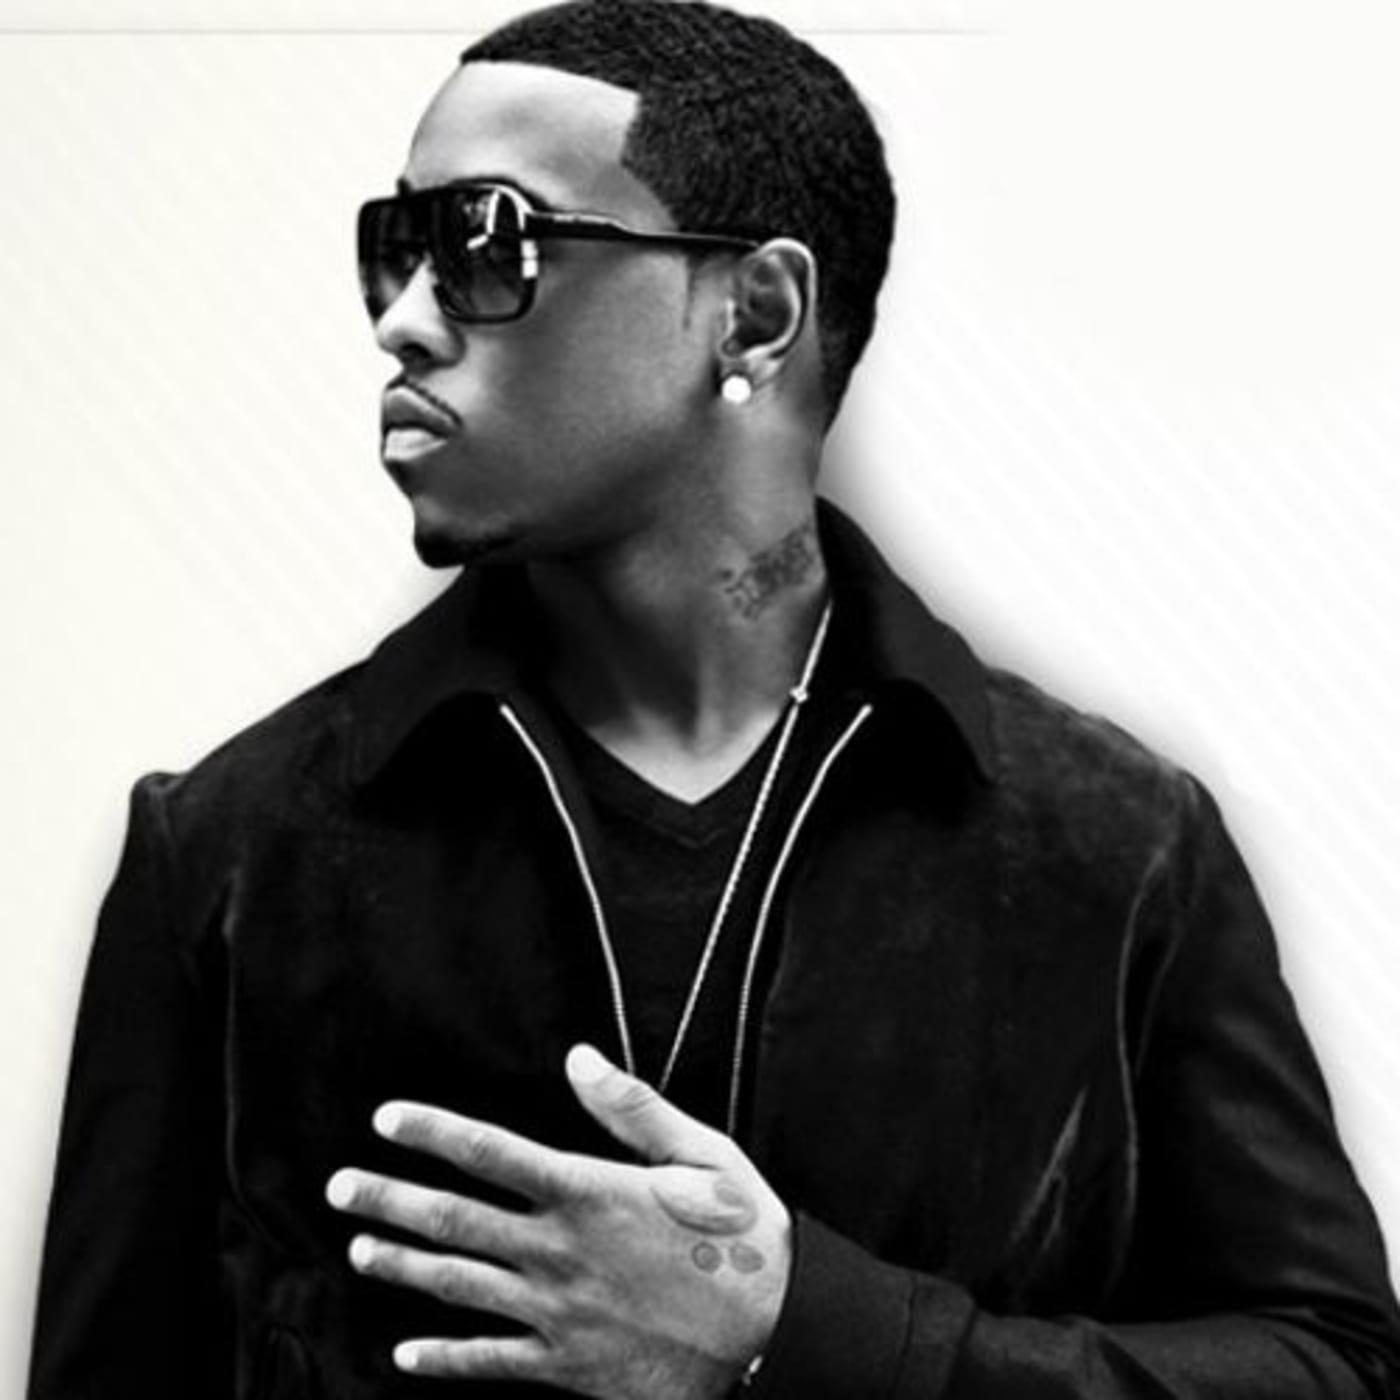 Listen to Jeremih's Money Do feat Gucci Mane